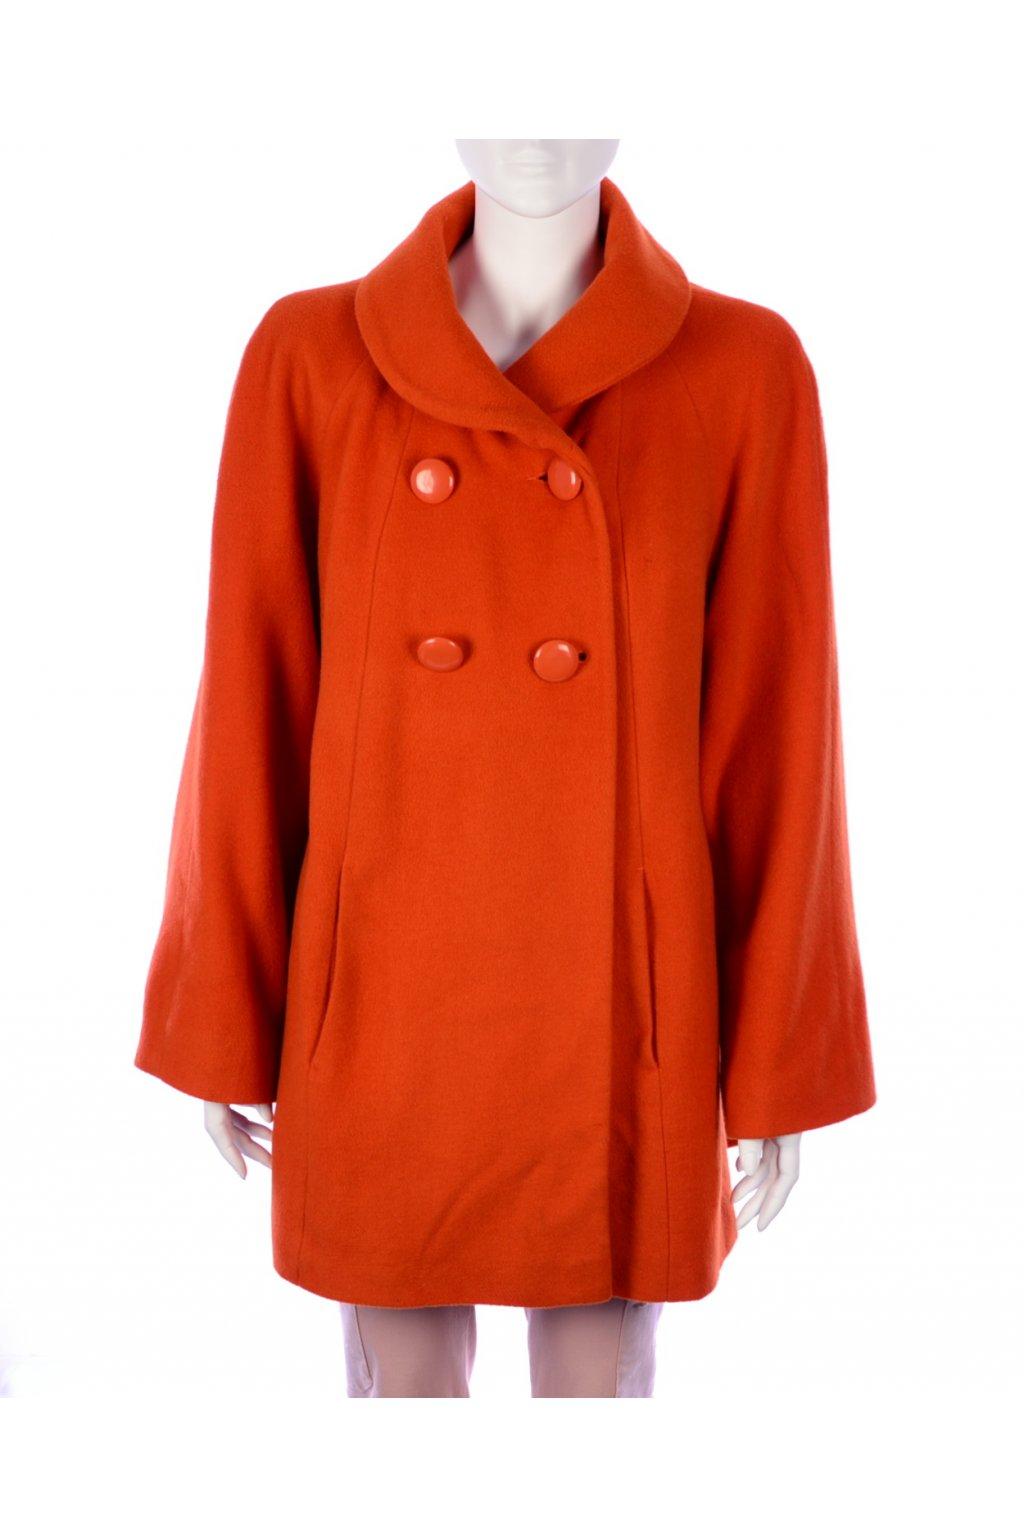 Kabát TU oranžový podzim zima 60%vlna vel. M / uk 14